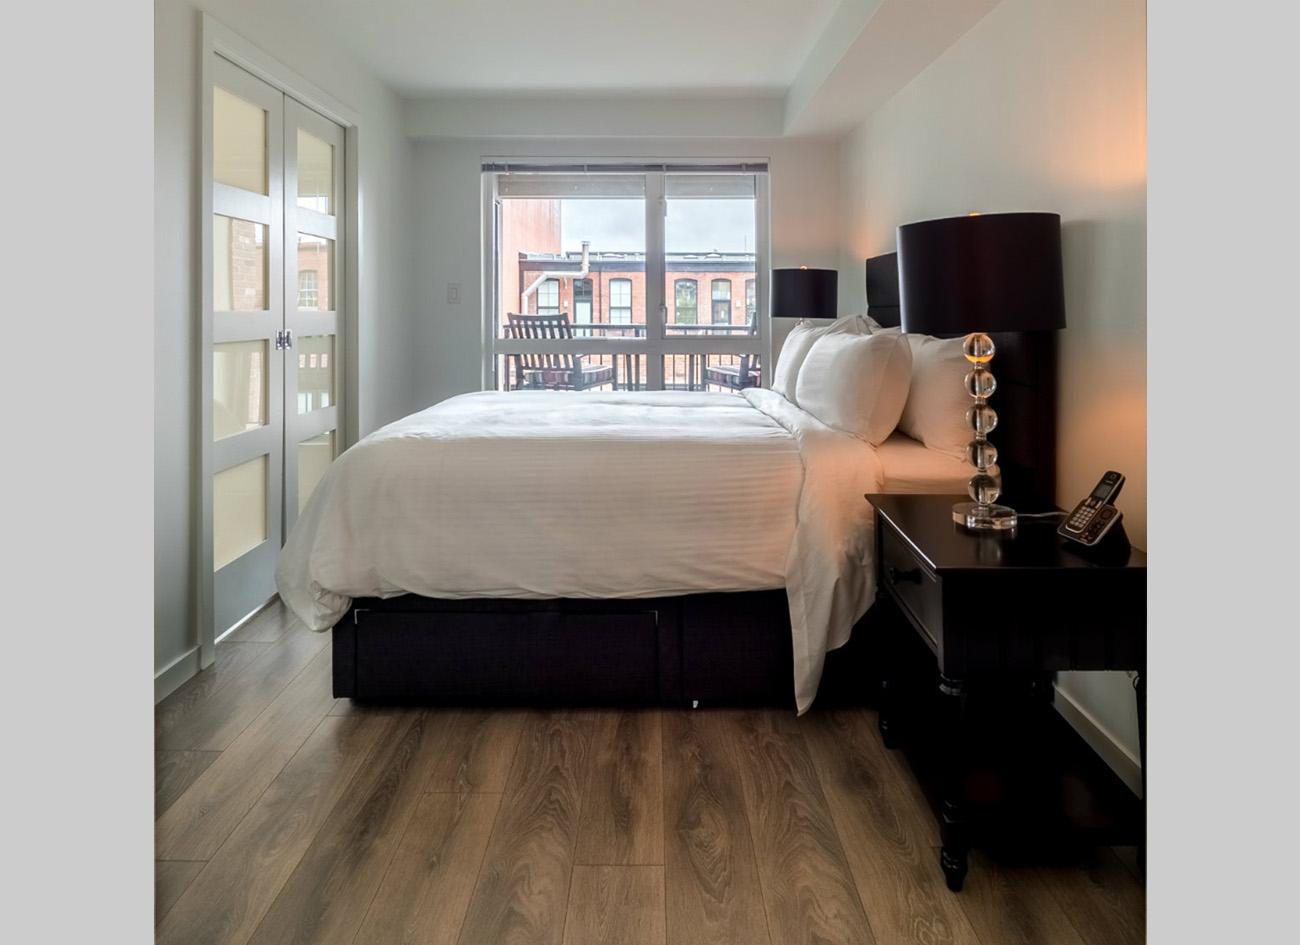 Union modern suites Victoria bedroom